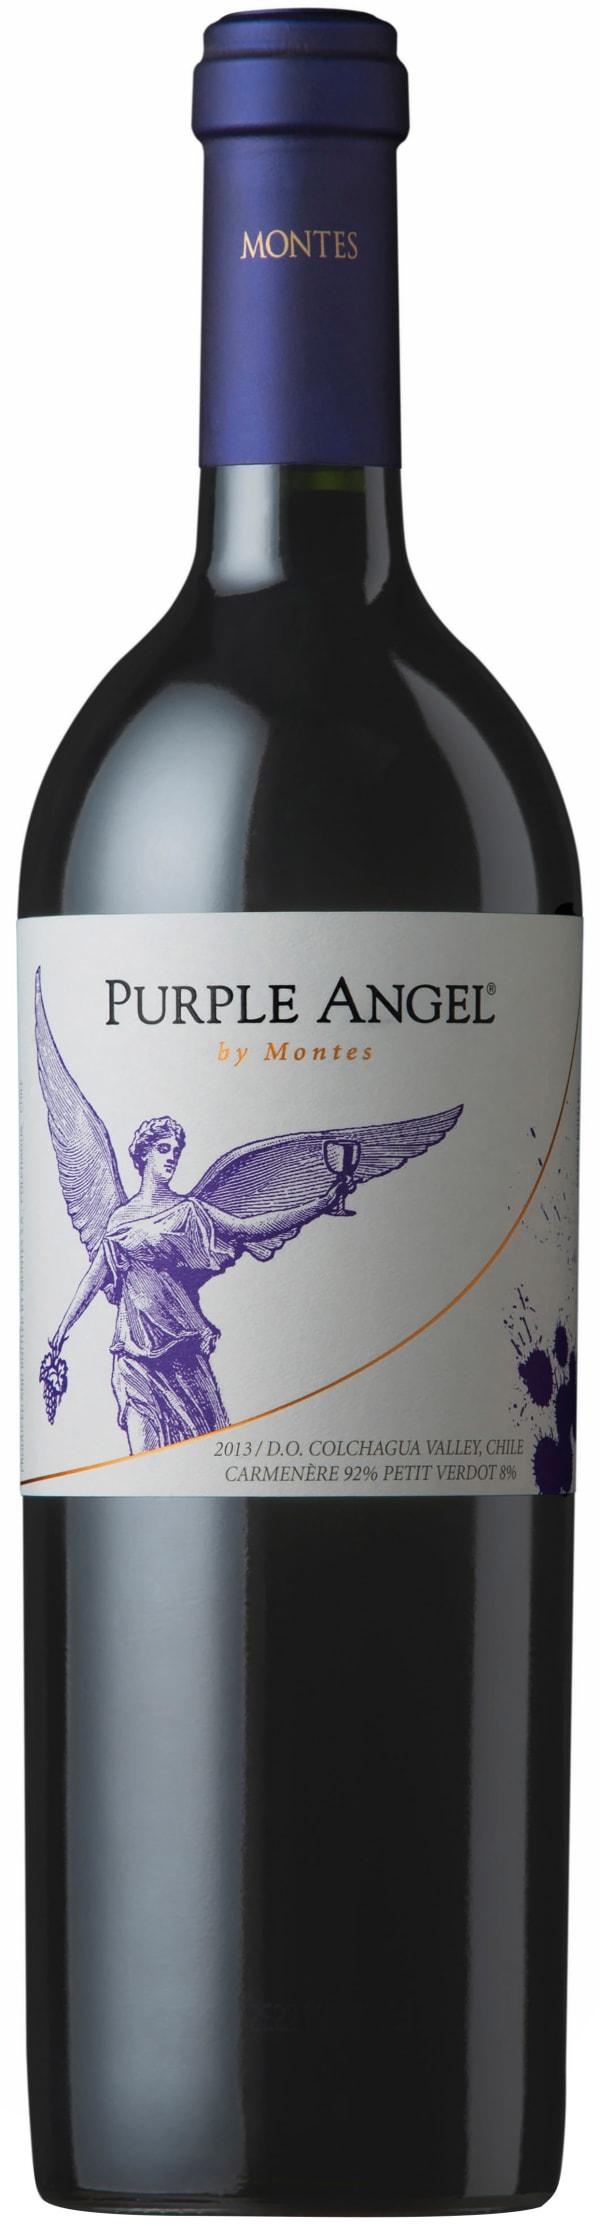 Montes Purple Angel 2013